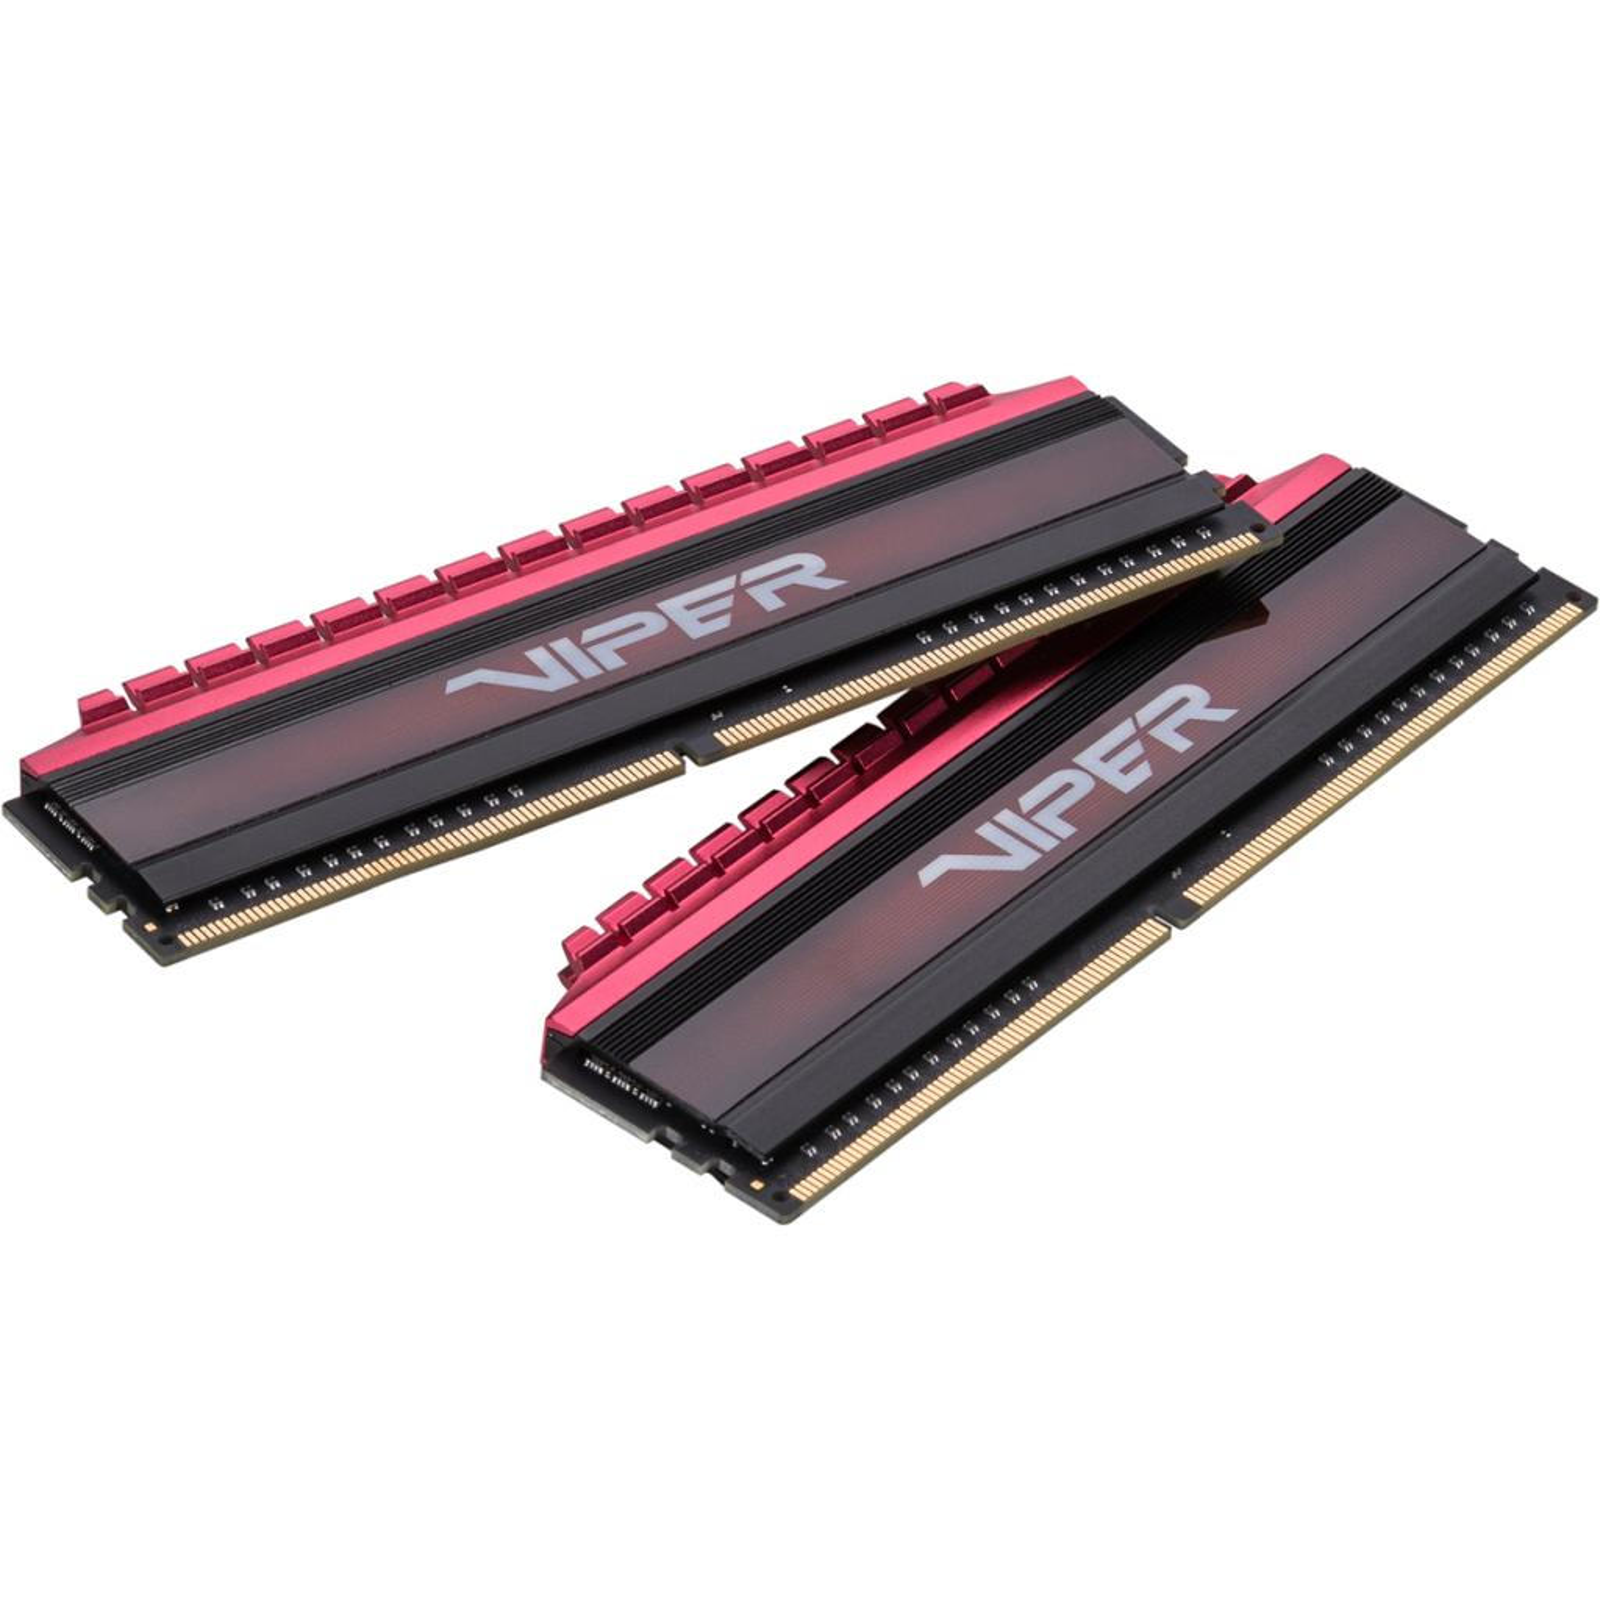 Модуль памяти для компьютера DDR4 16GB (2x8GB) 2666 MHz PE-V4 BLK/RED DUALCH Patriot (PV416G266C5K)